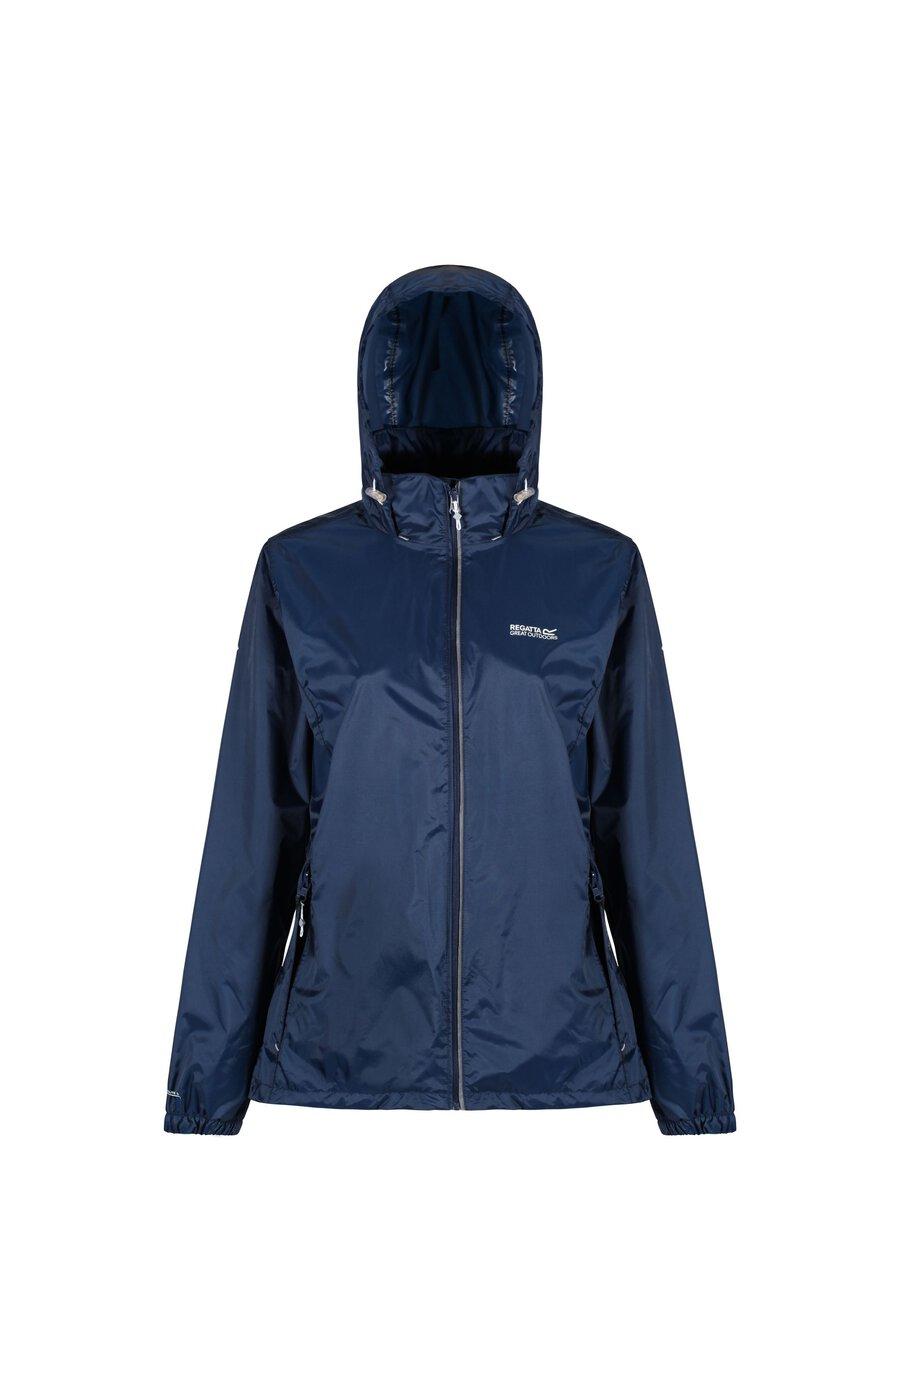 Damen Trekkingjacke Jacke Outdoorjacke 38 40 44